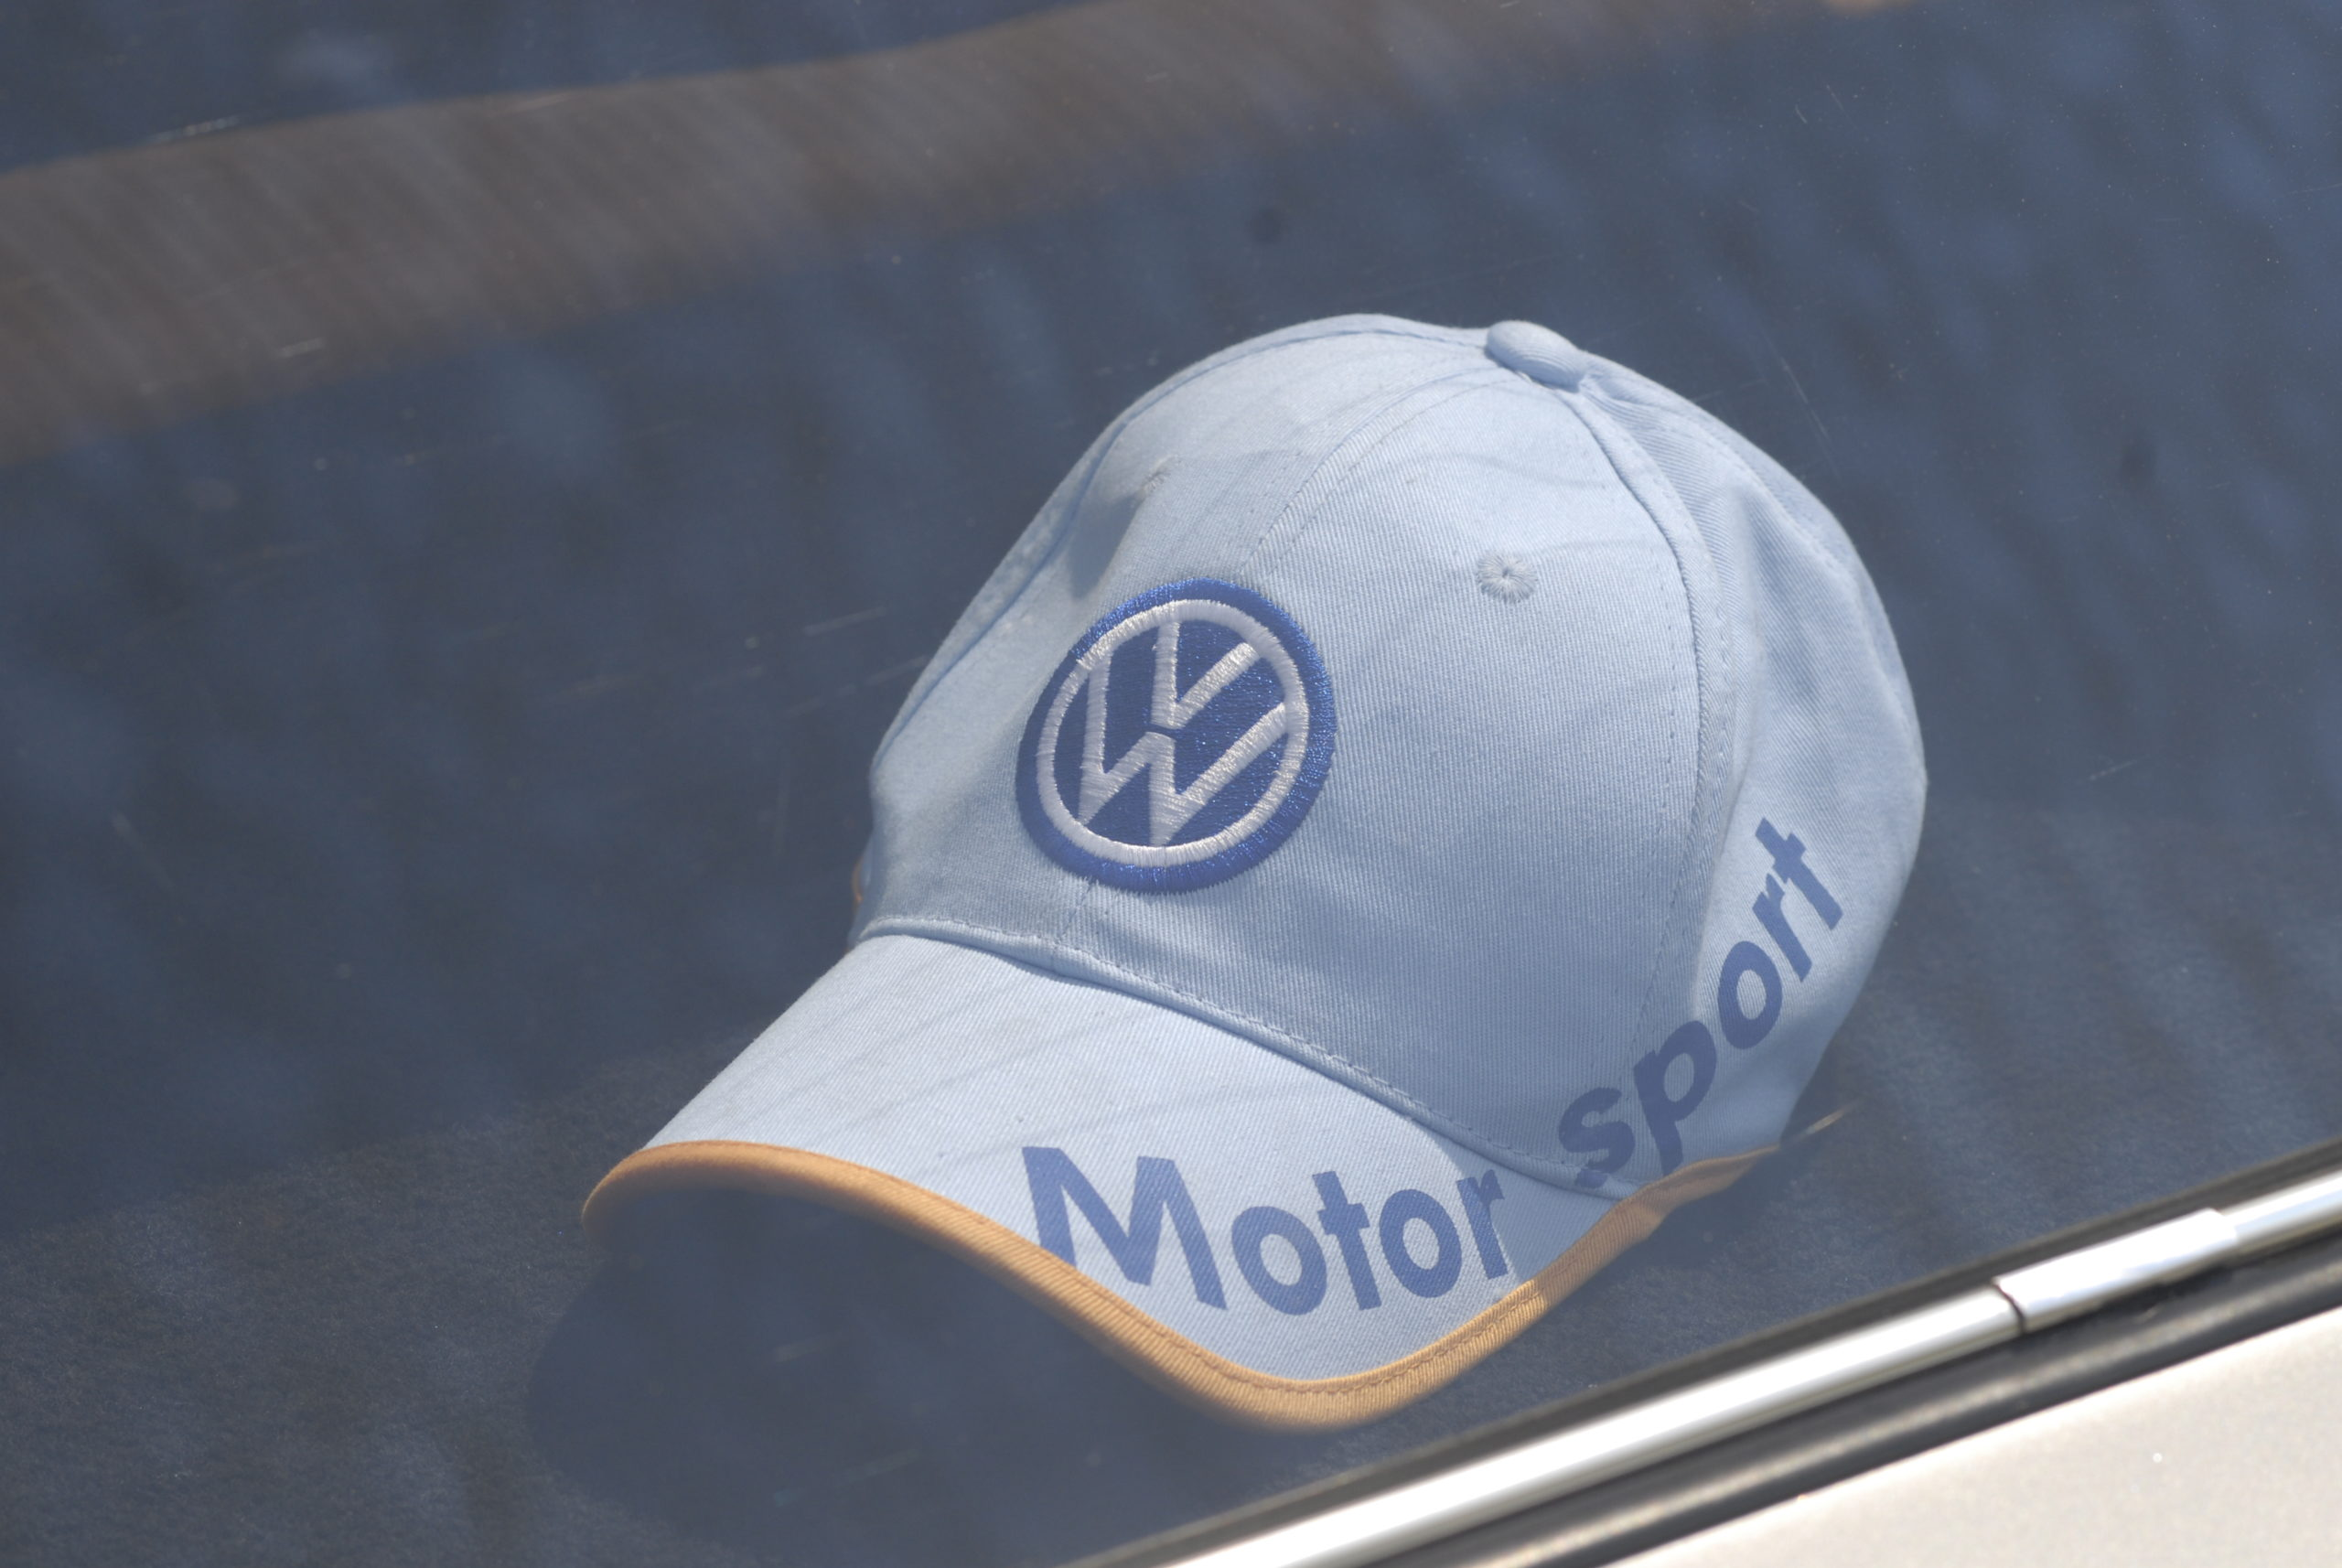 Tuning-VW-Golf-Mk1-CL-czapeczka VW Motorsport